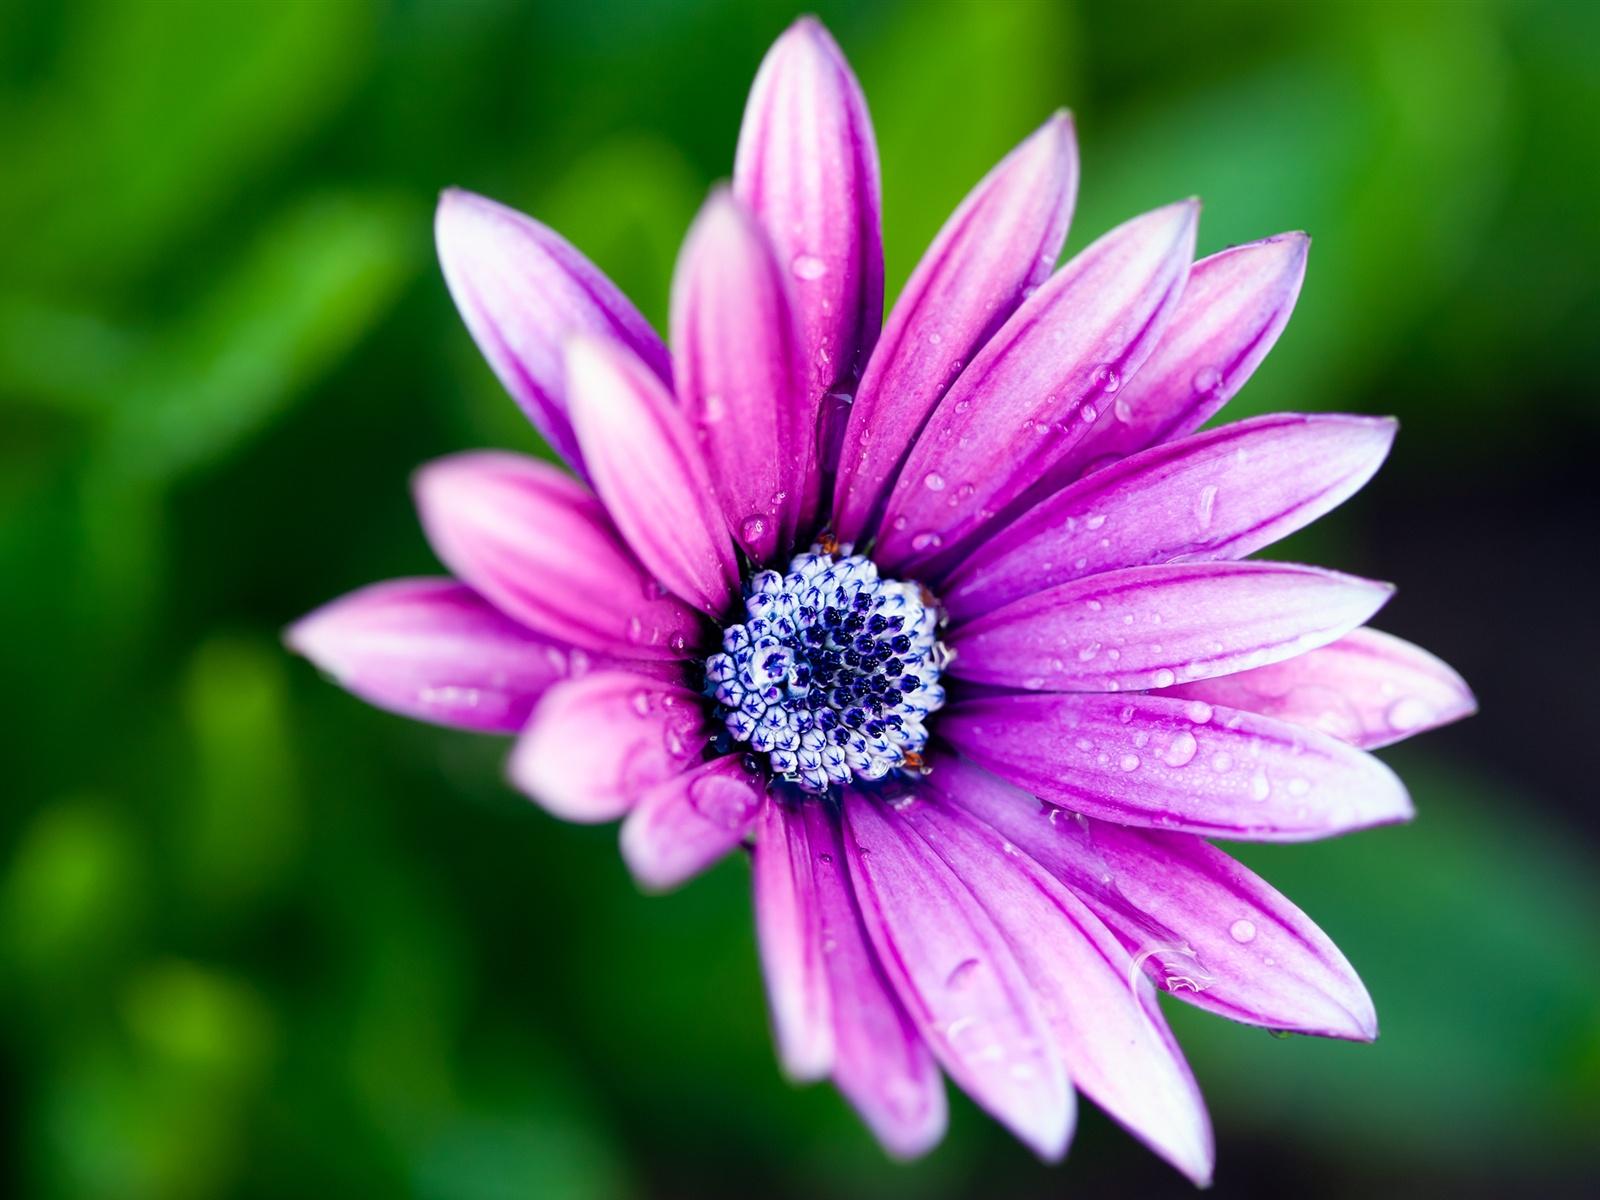 Hintergrundbilder Blaue Blume: Lila Blüten, Blaue Blume Kern, Morgentau 2560x1600 HD